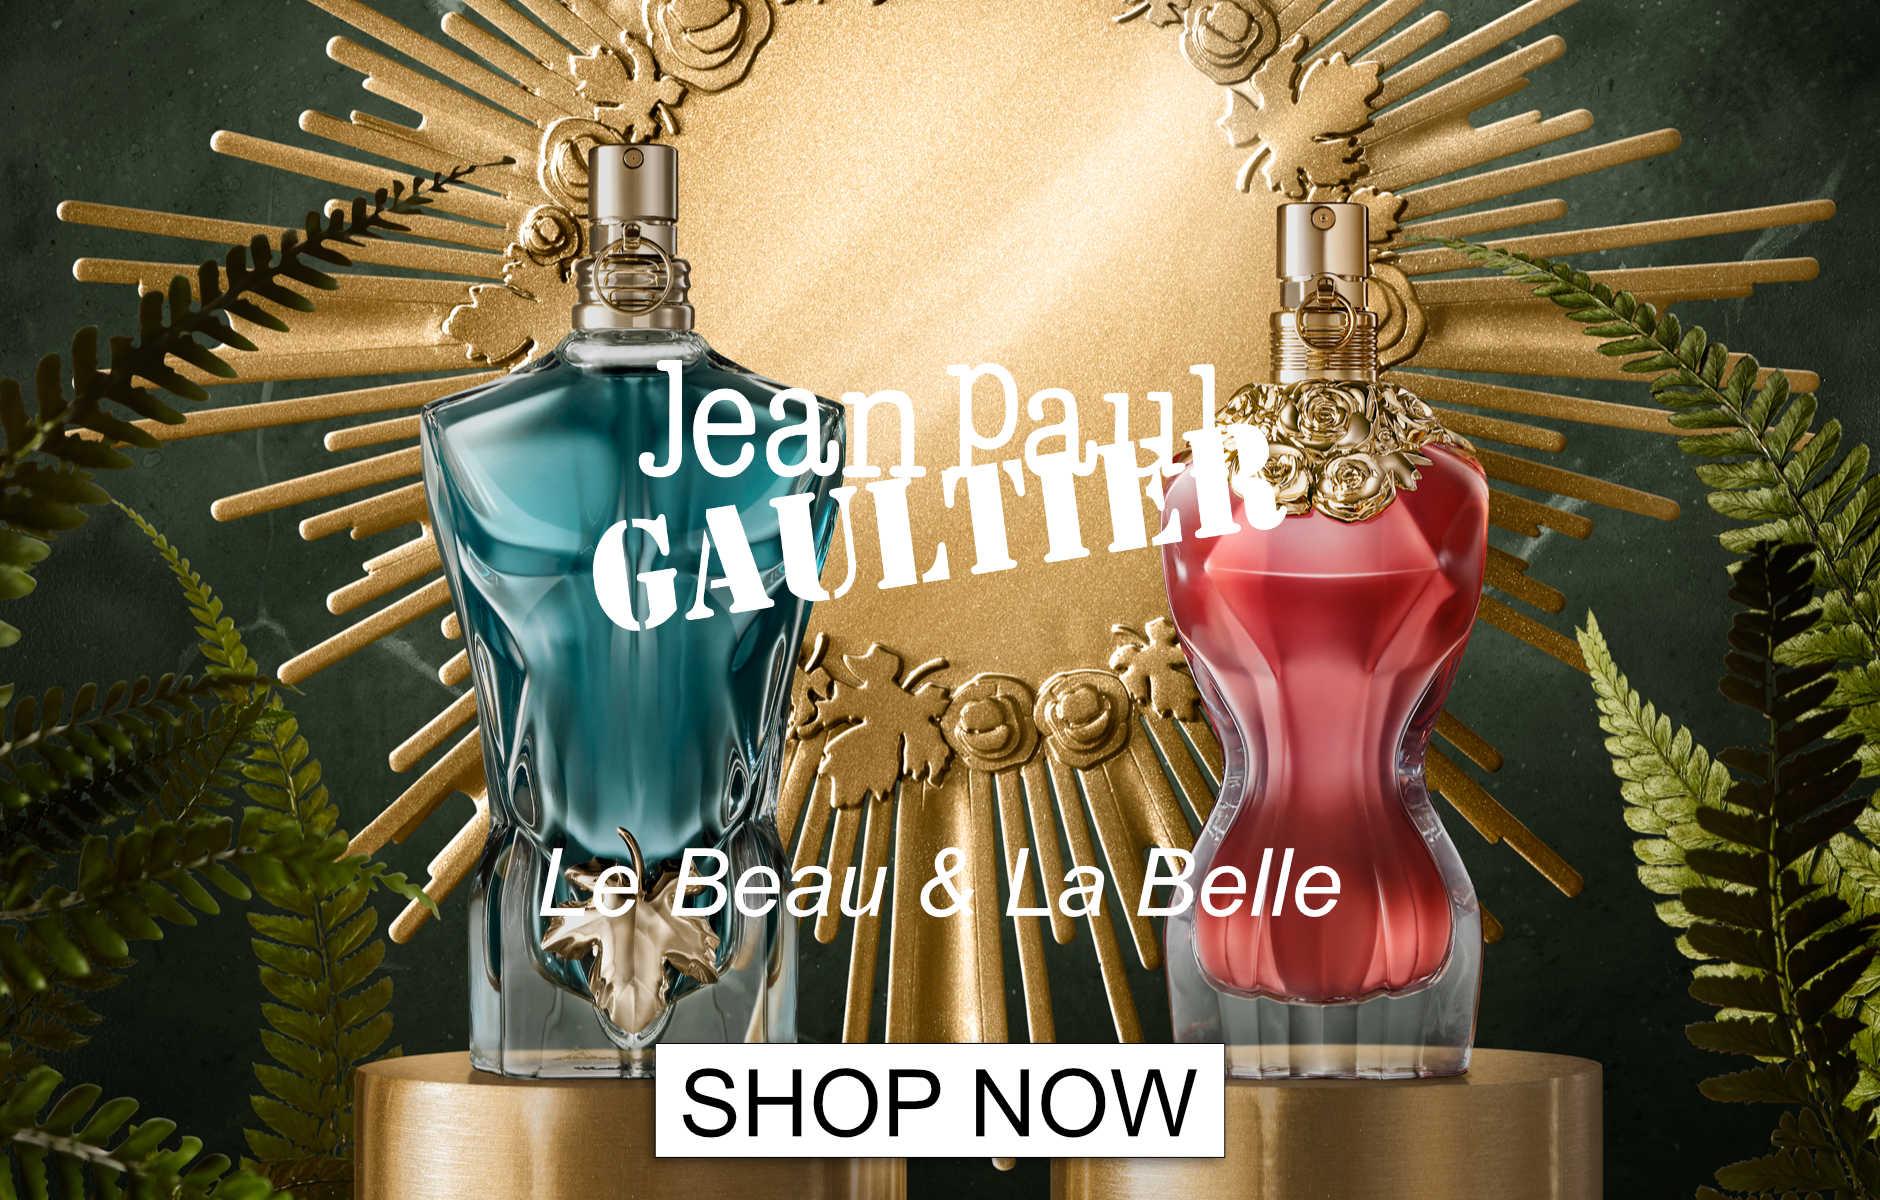 JPG Le Beau & La Belle